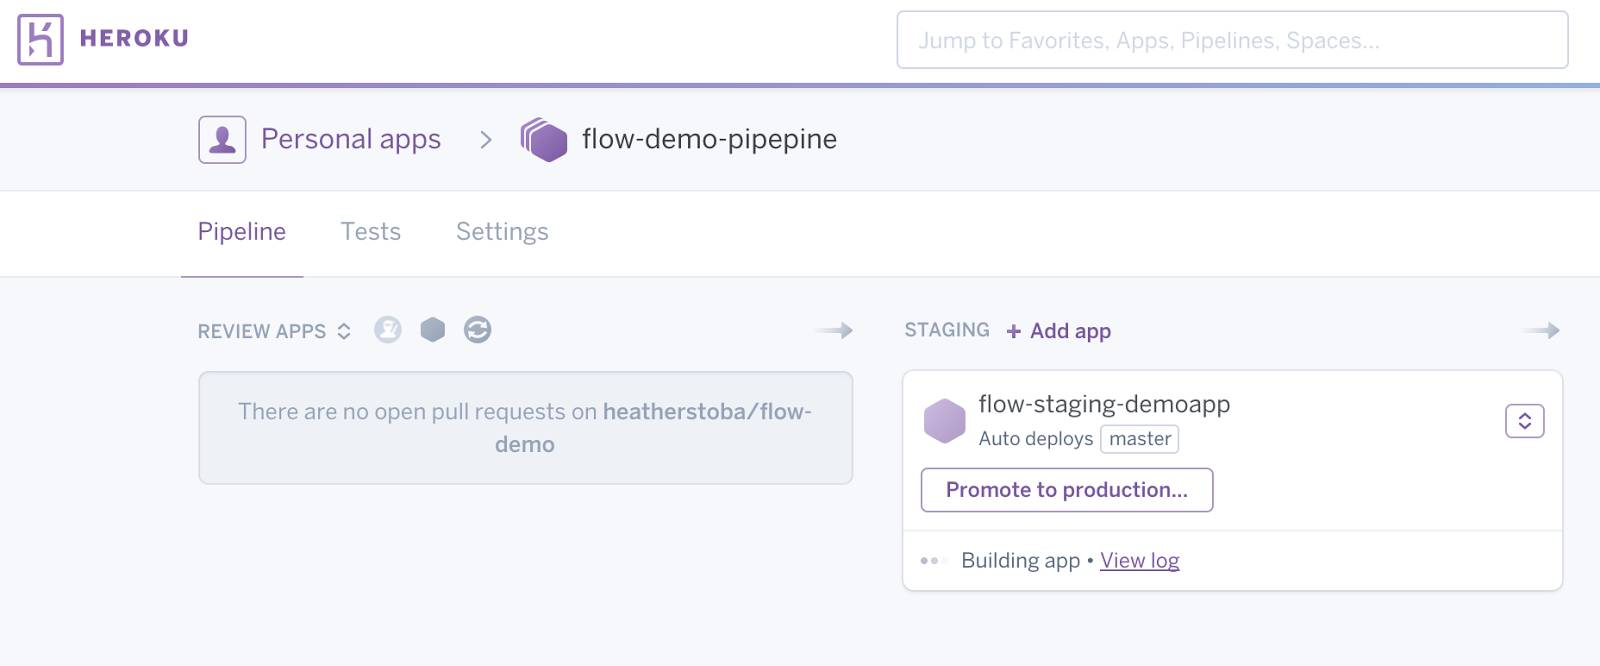 Staging app is built